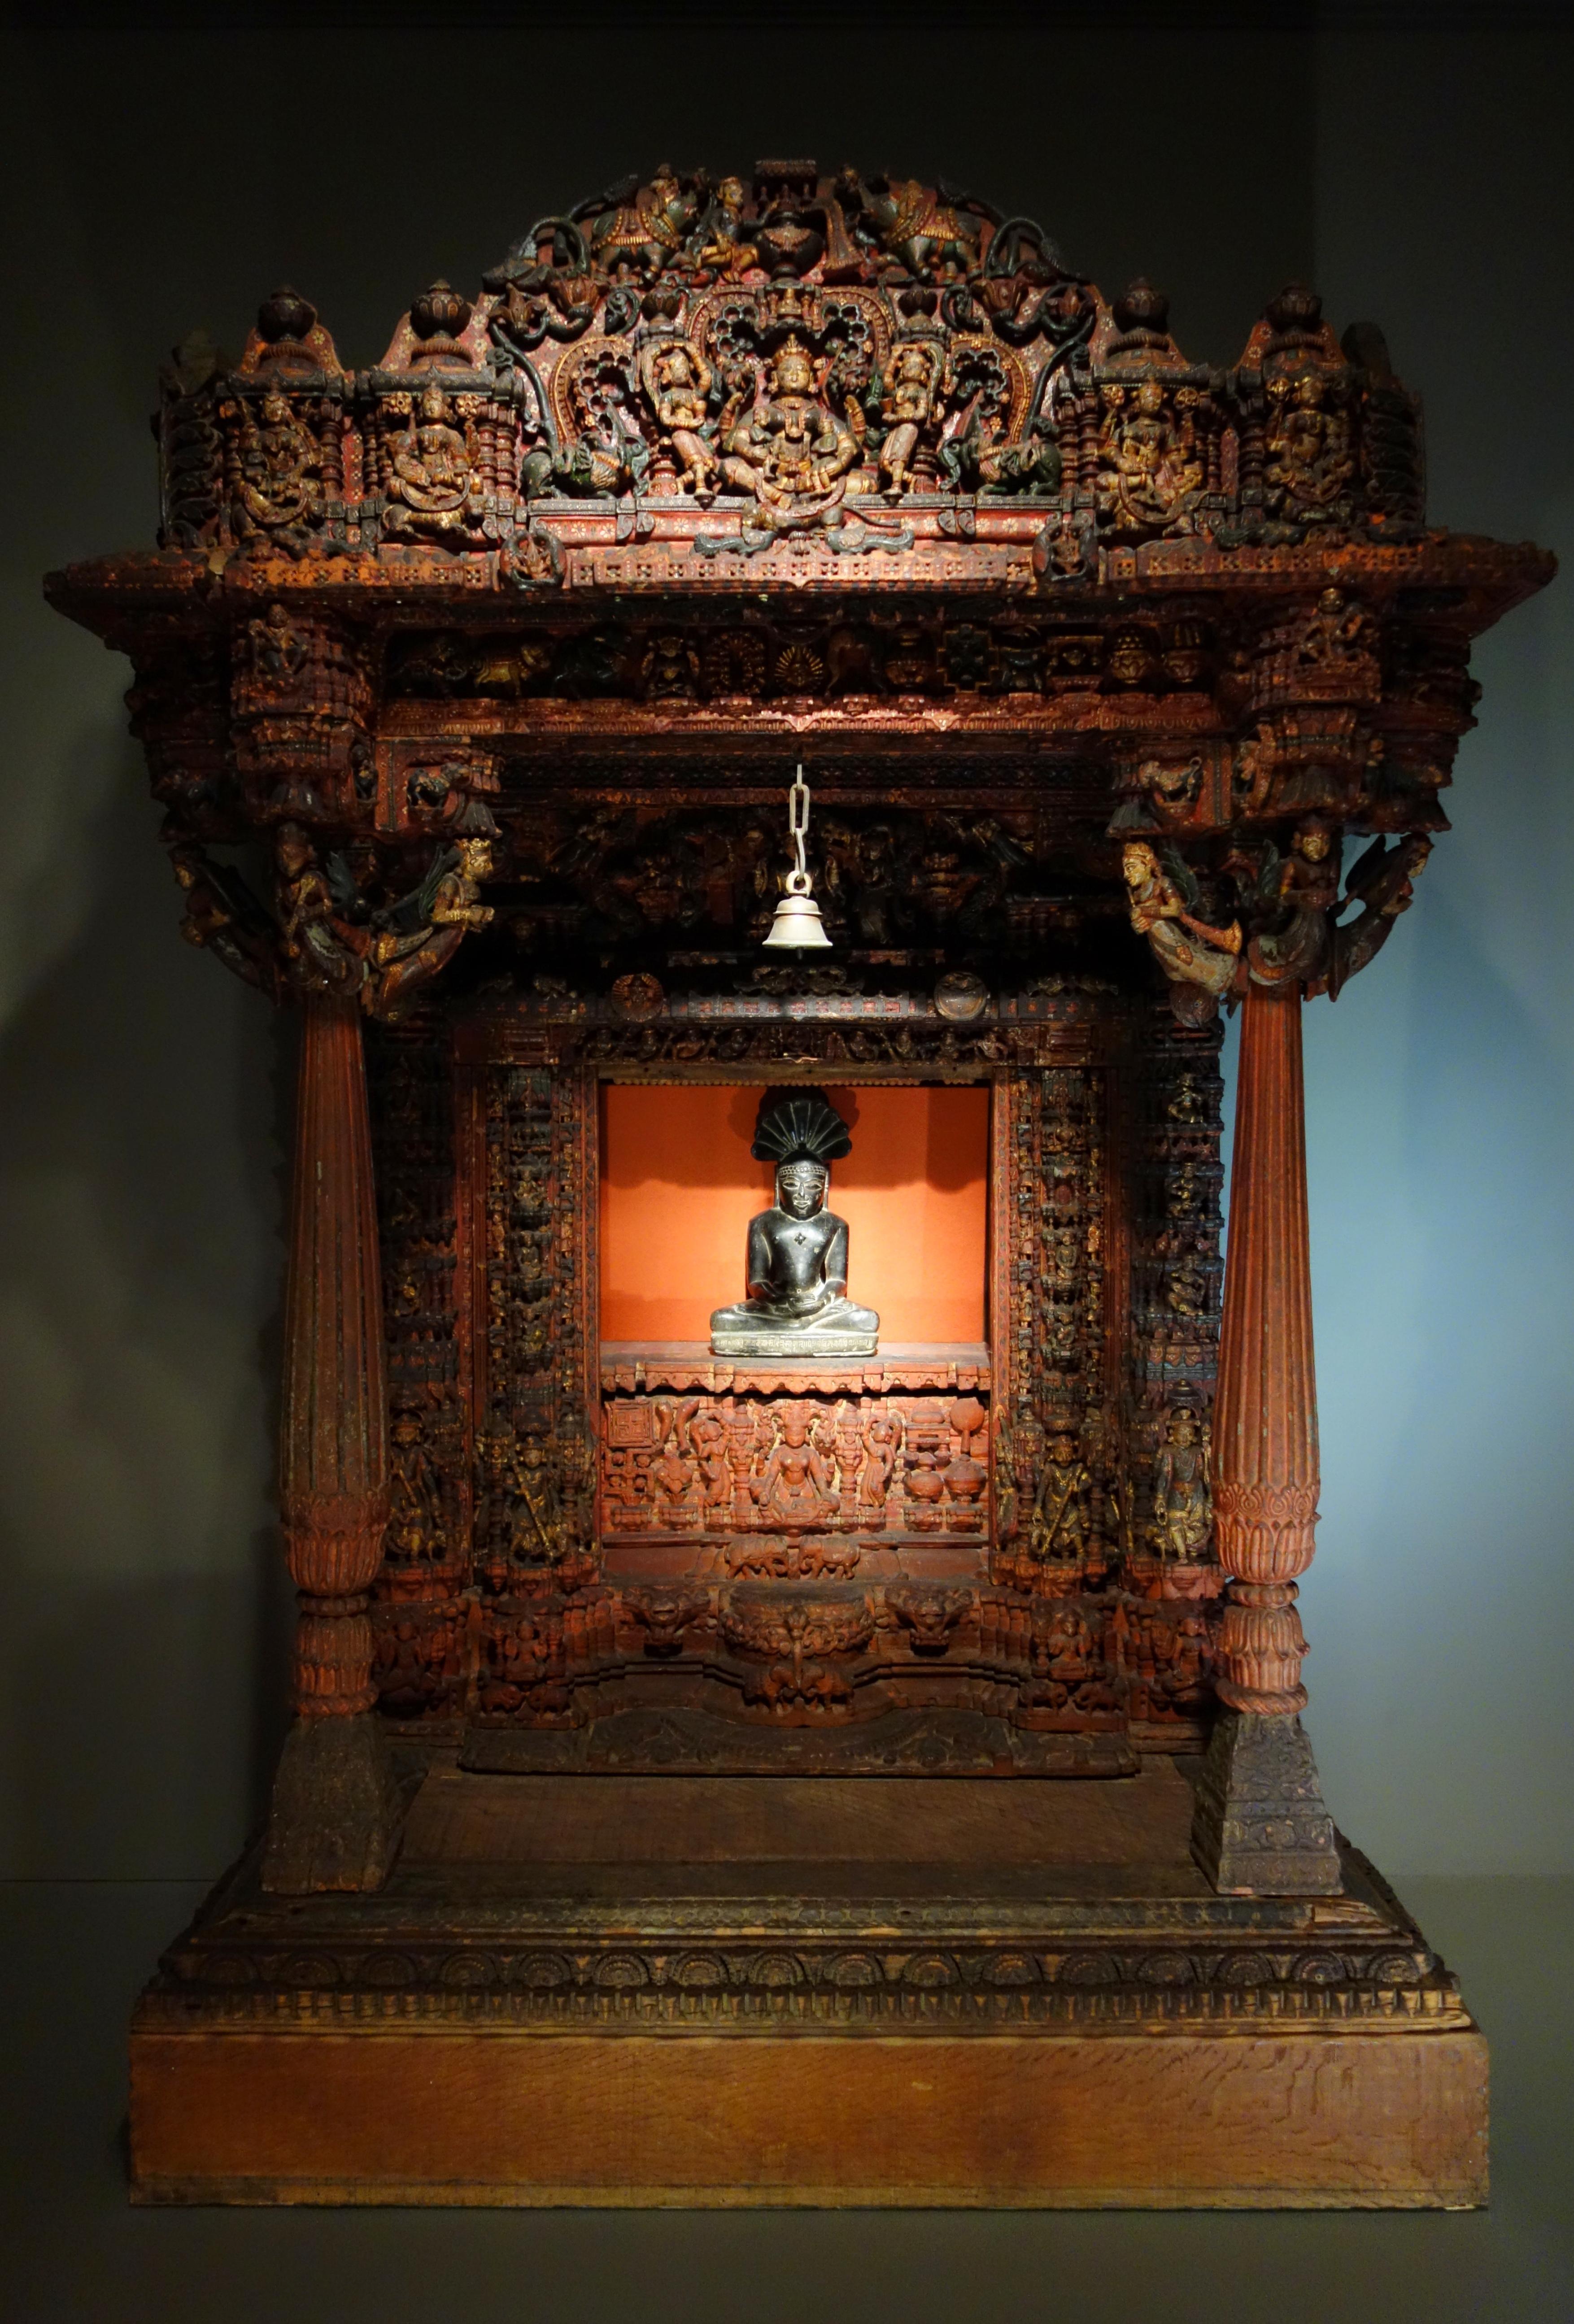 File:Jain shrine, Patan, Gujarat, India, early 17th ...